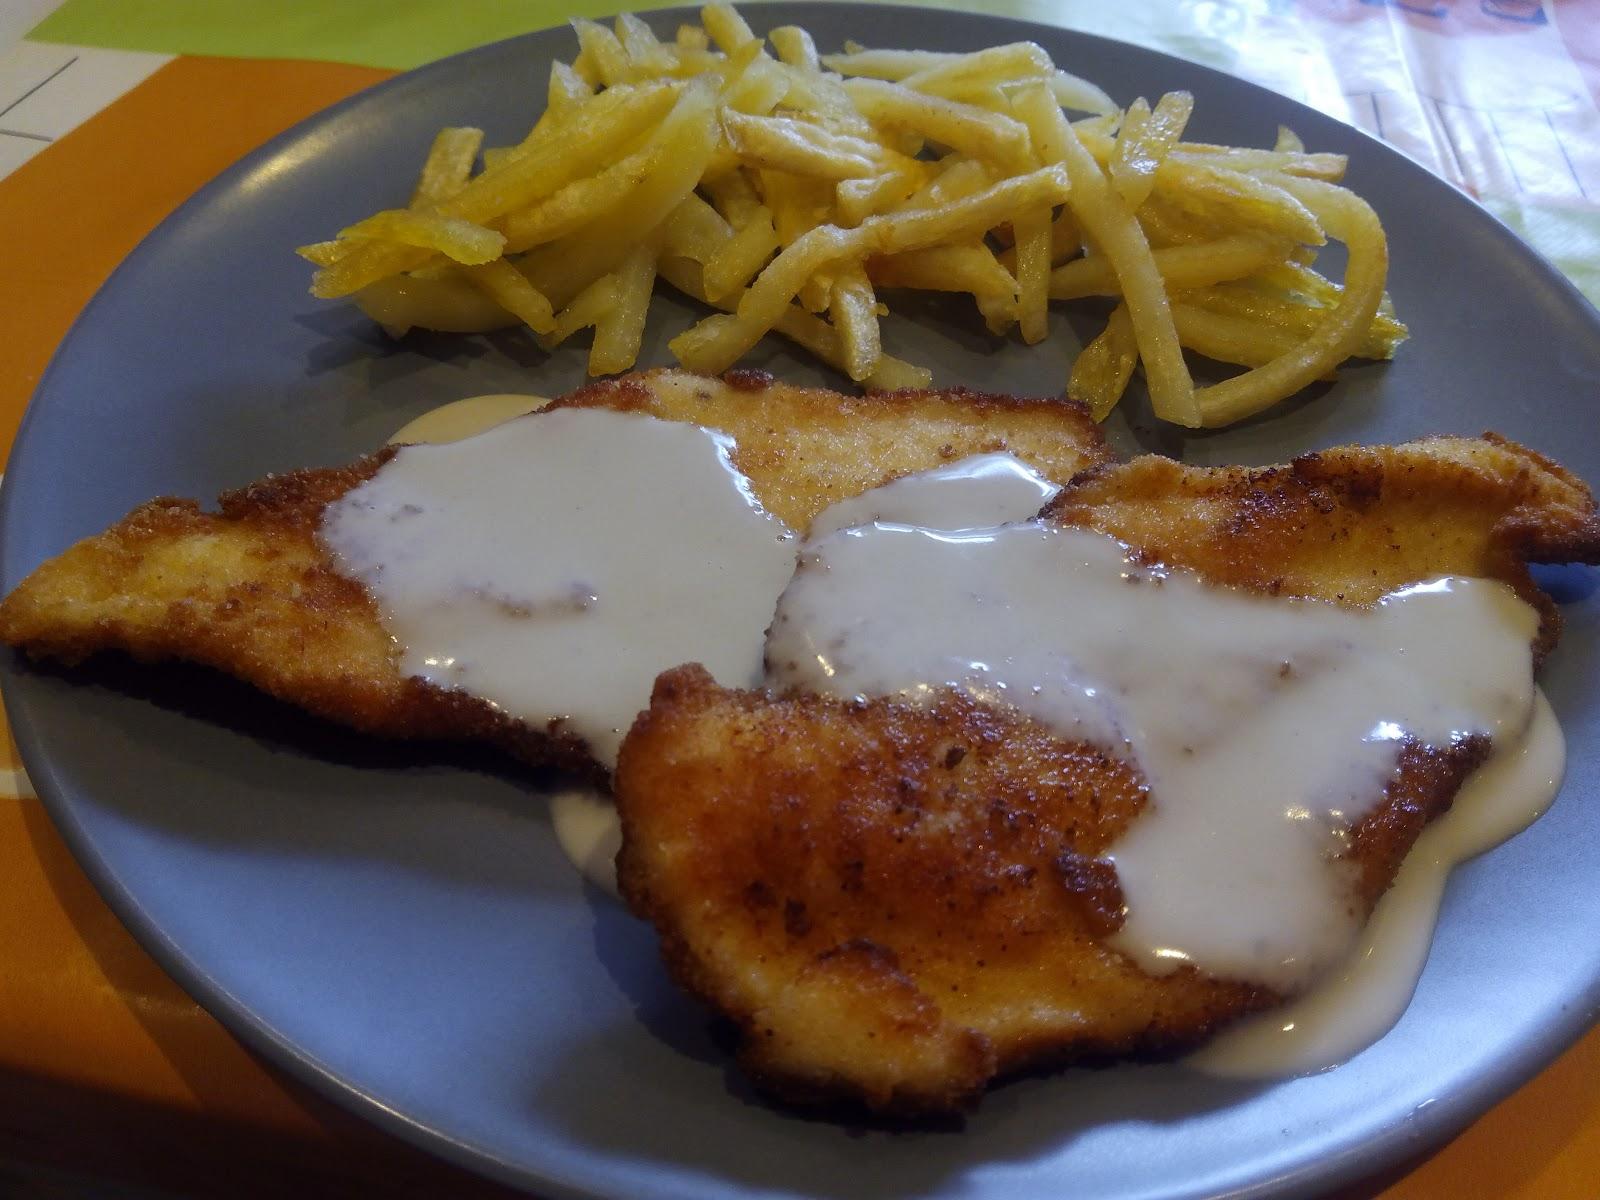 Cocina con rachel escalopes de pollo al cabrales - Racholas cocina ...